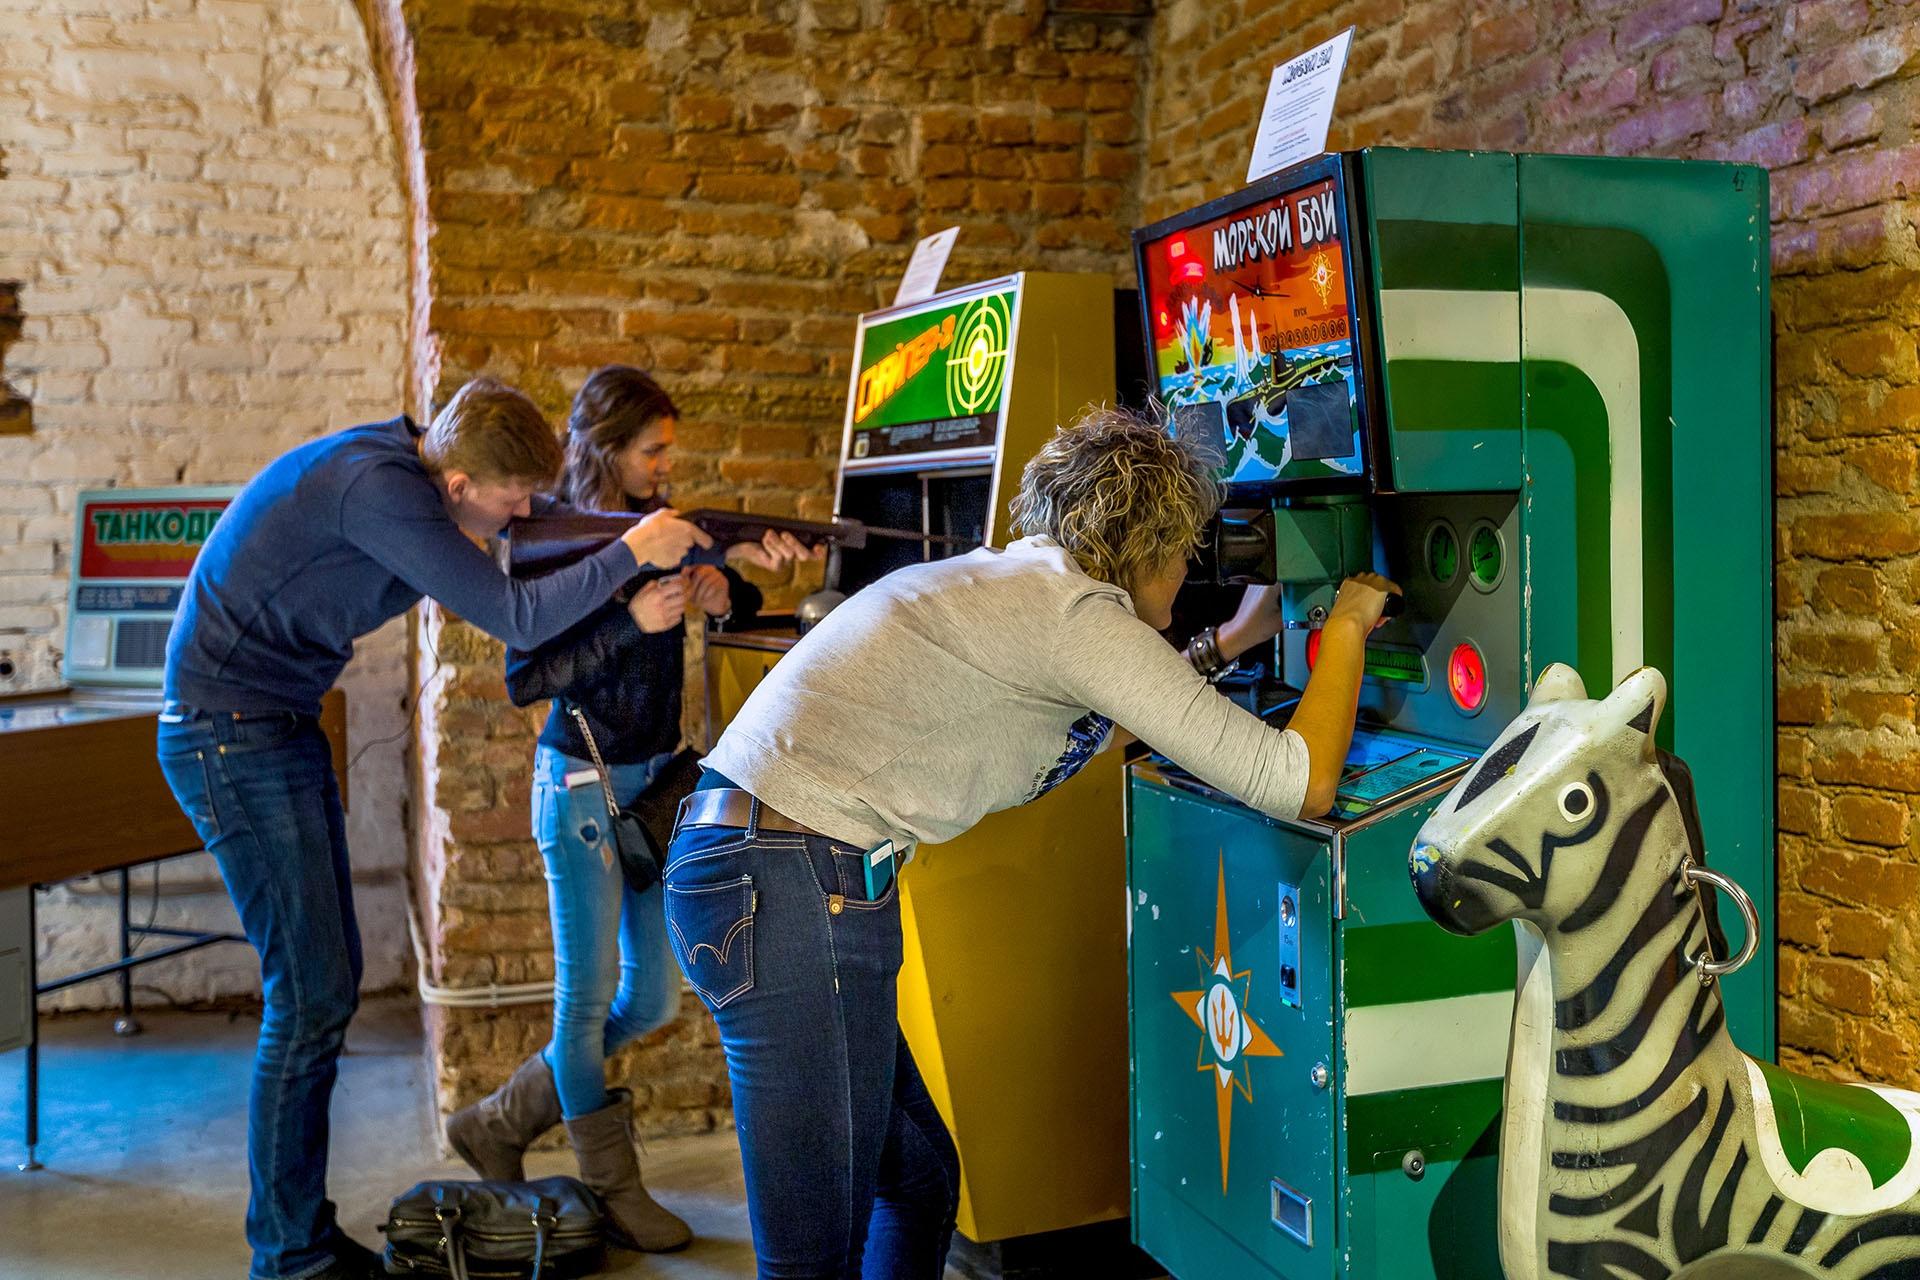 Having fun playing on the Soviet arcade machines!